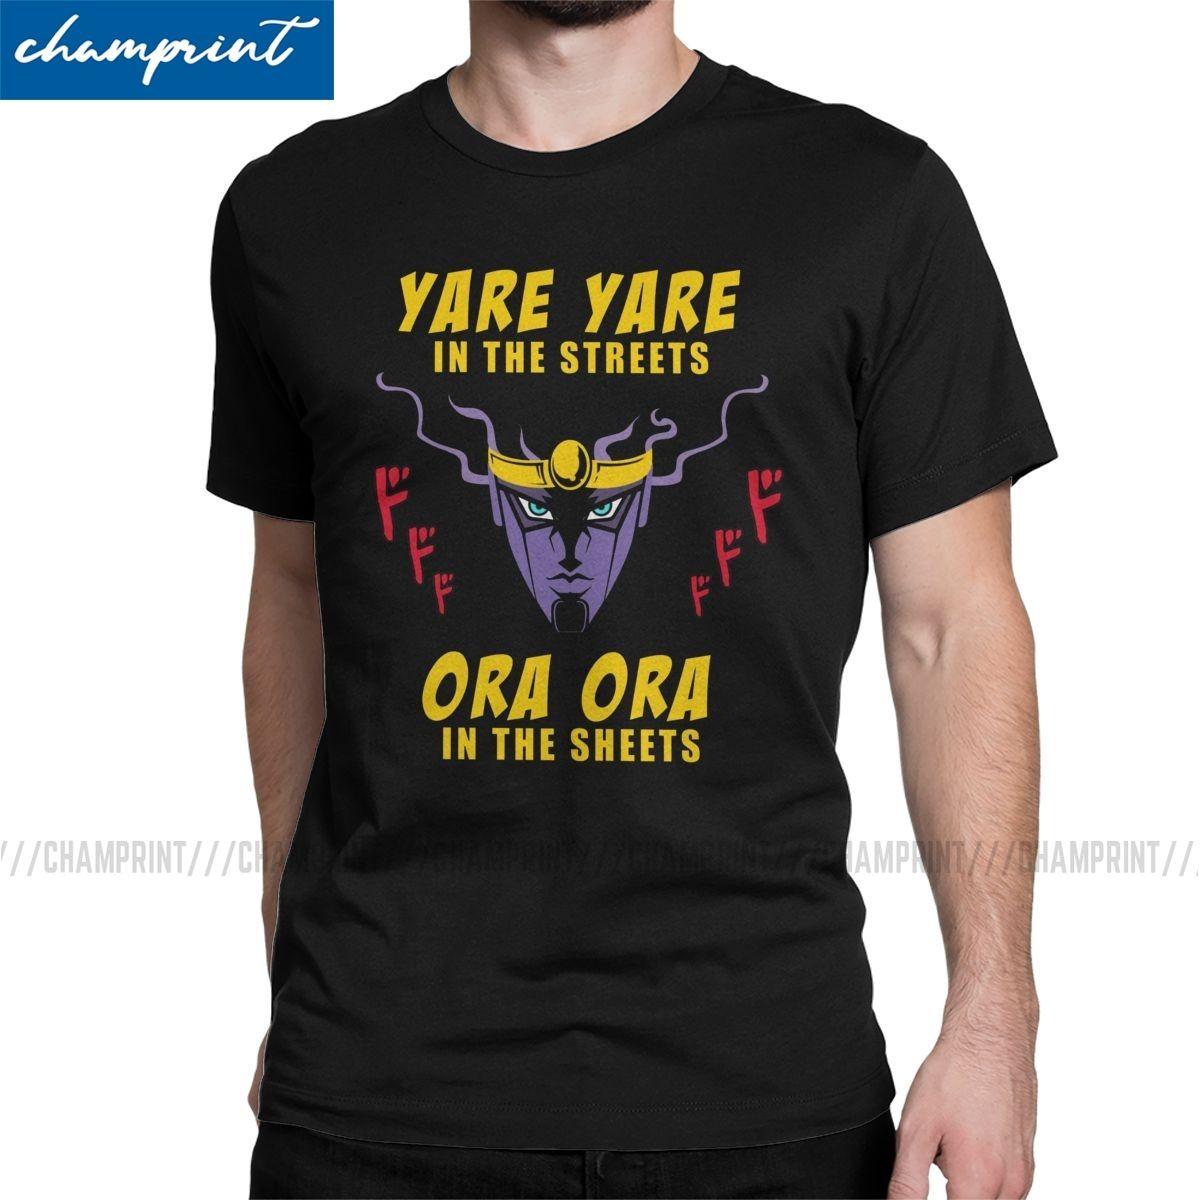 Uomo T-shirt Yare Yare In The Streets Fun Tee Shirt Jojos Bizzarre Avventure Anime Manga Jjba maglietta rotonda Colletto